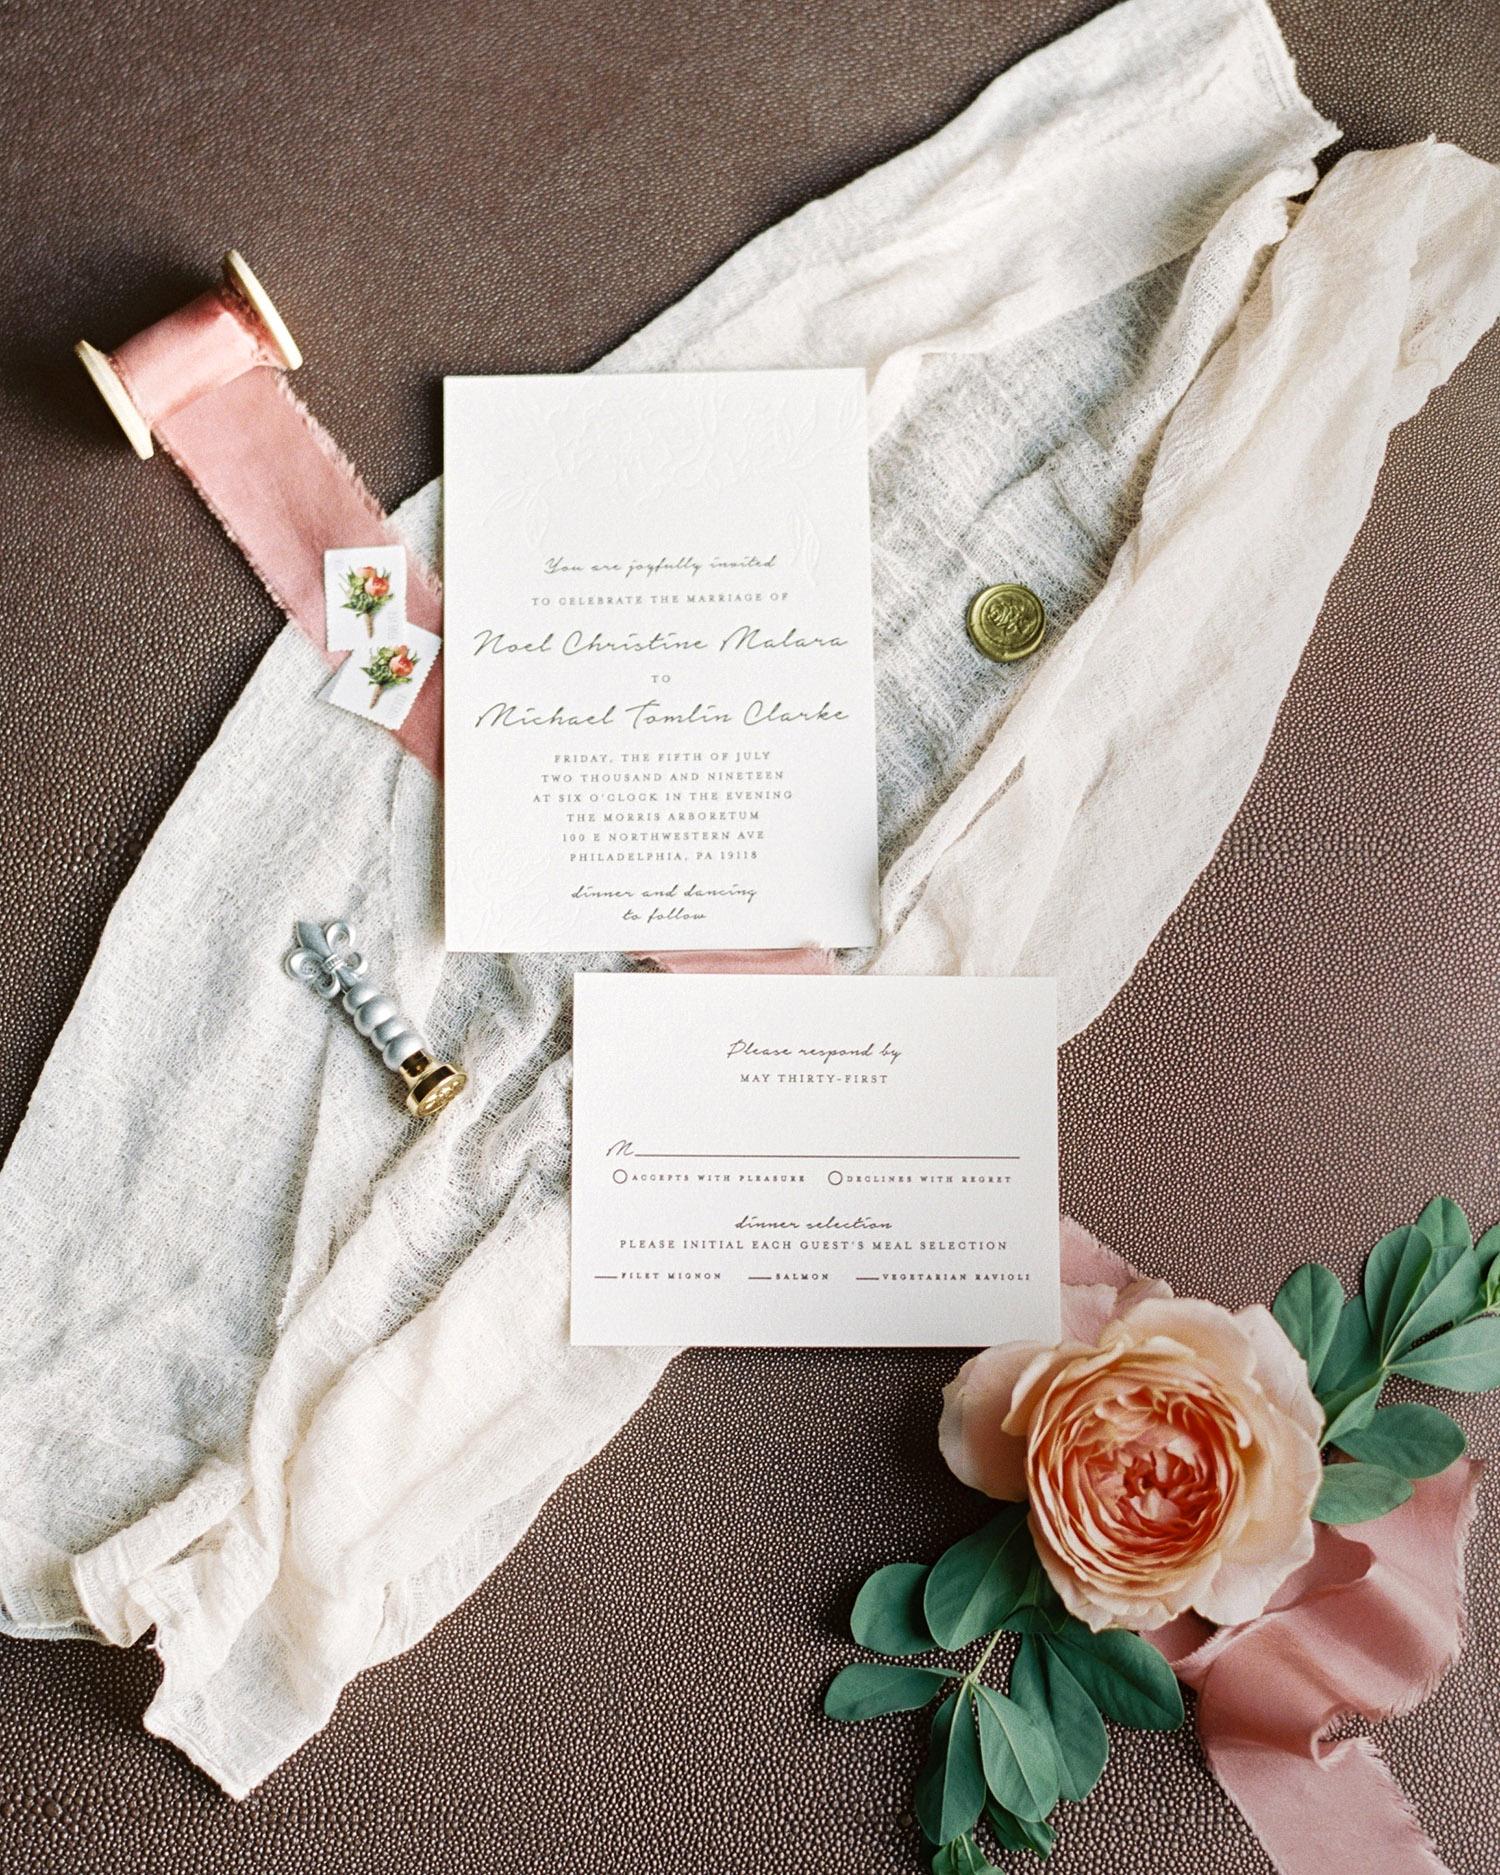 noel mike wedding invitations